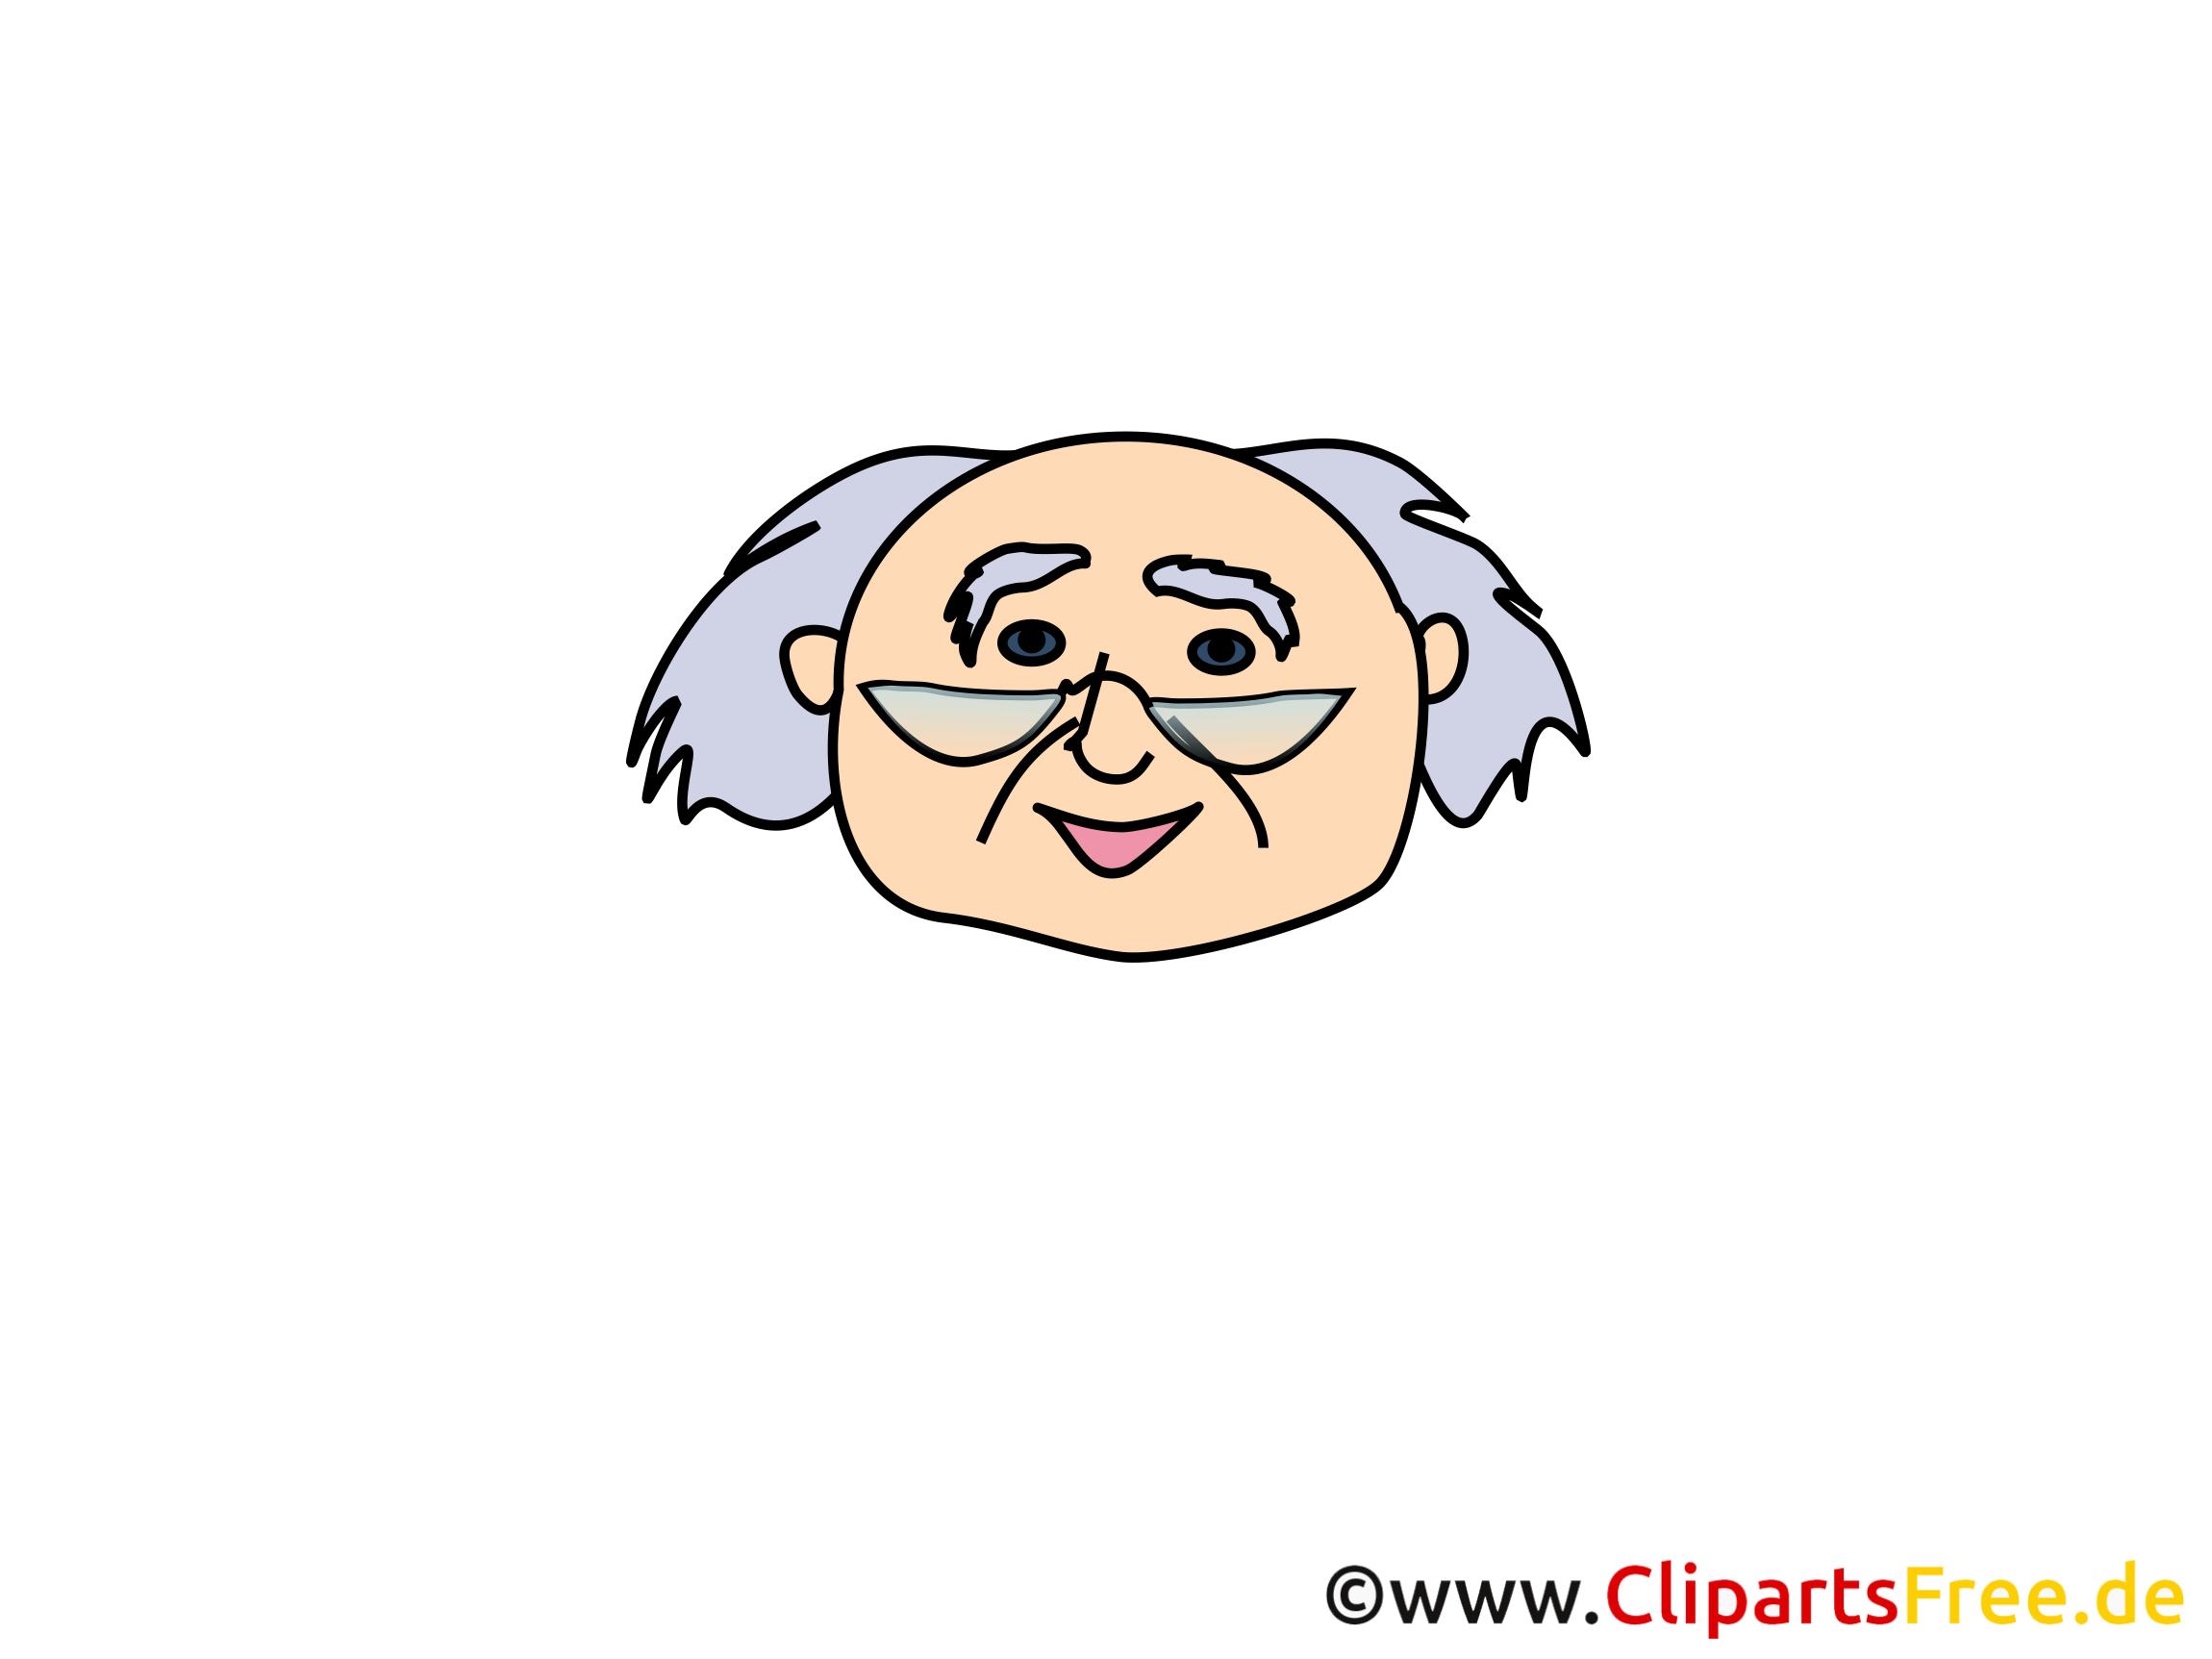 cartoons menschen: